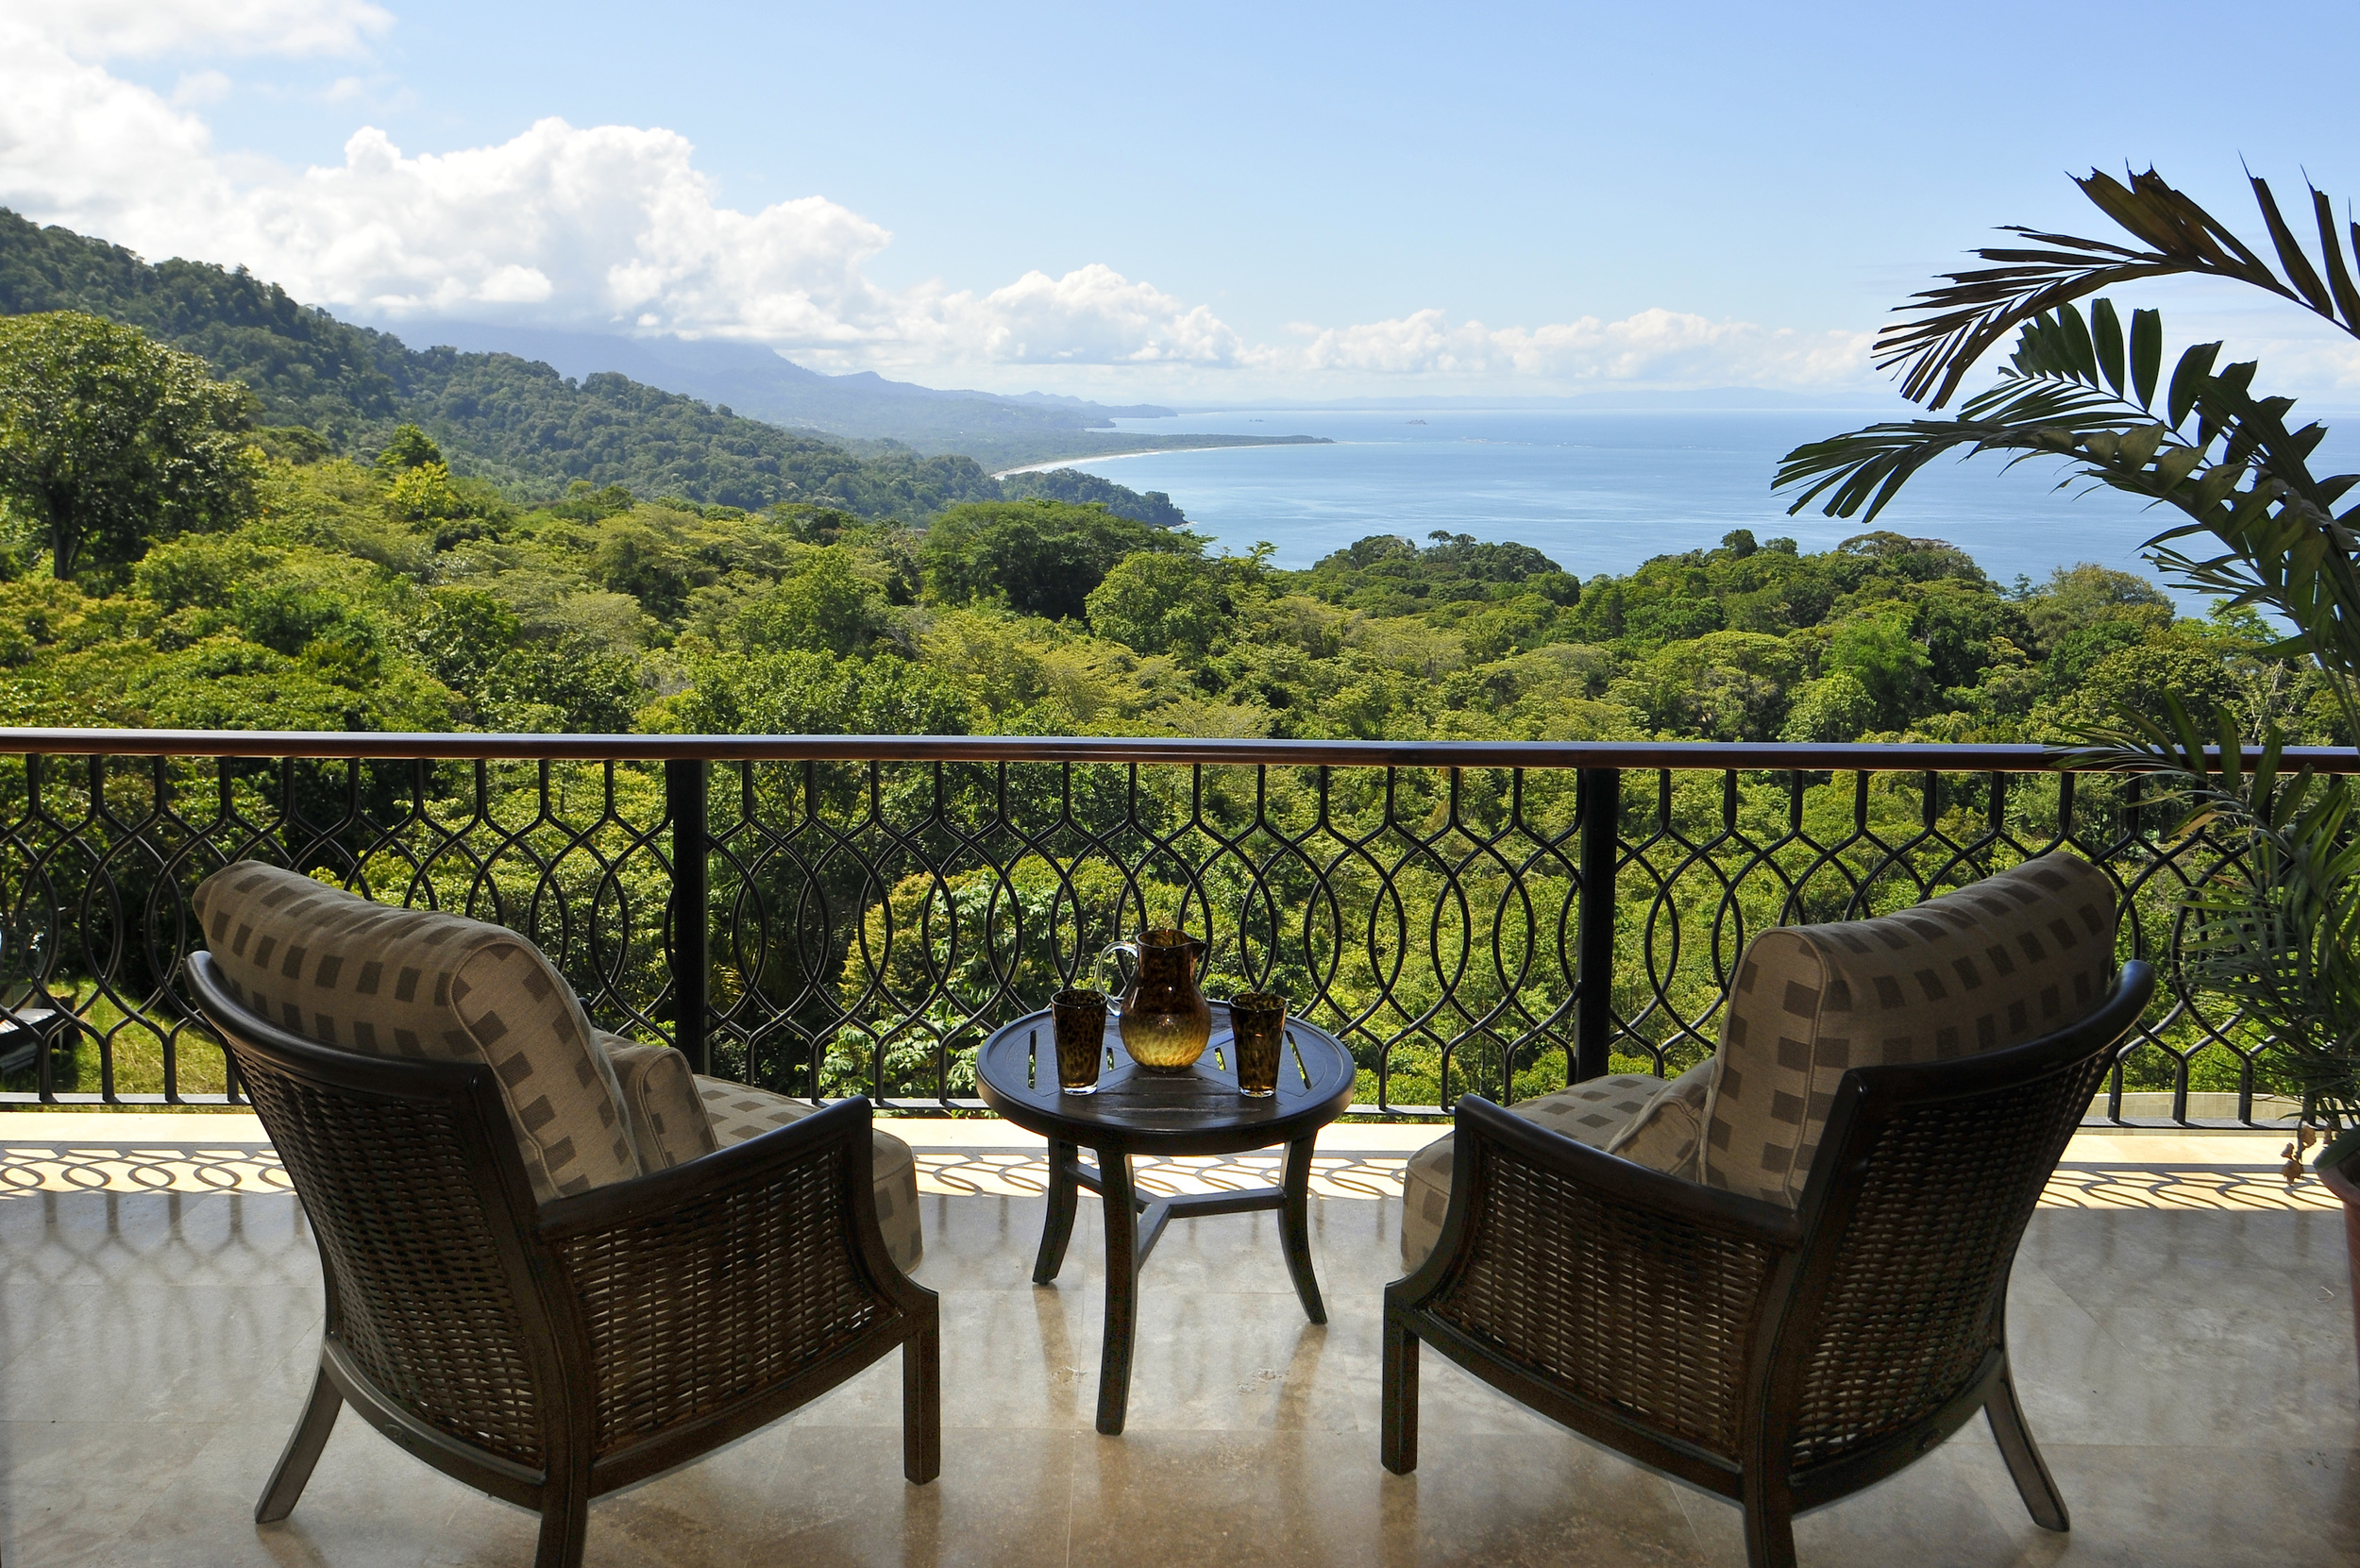 flex5-yoga-retreat-costa-rica-villa-living-room-view.jpg